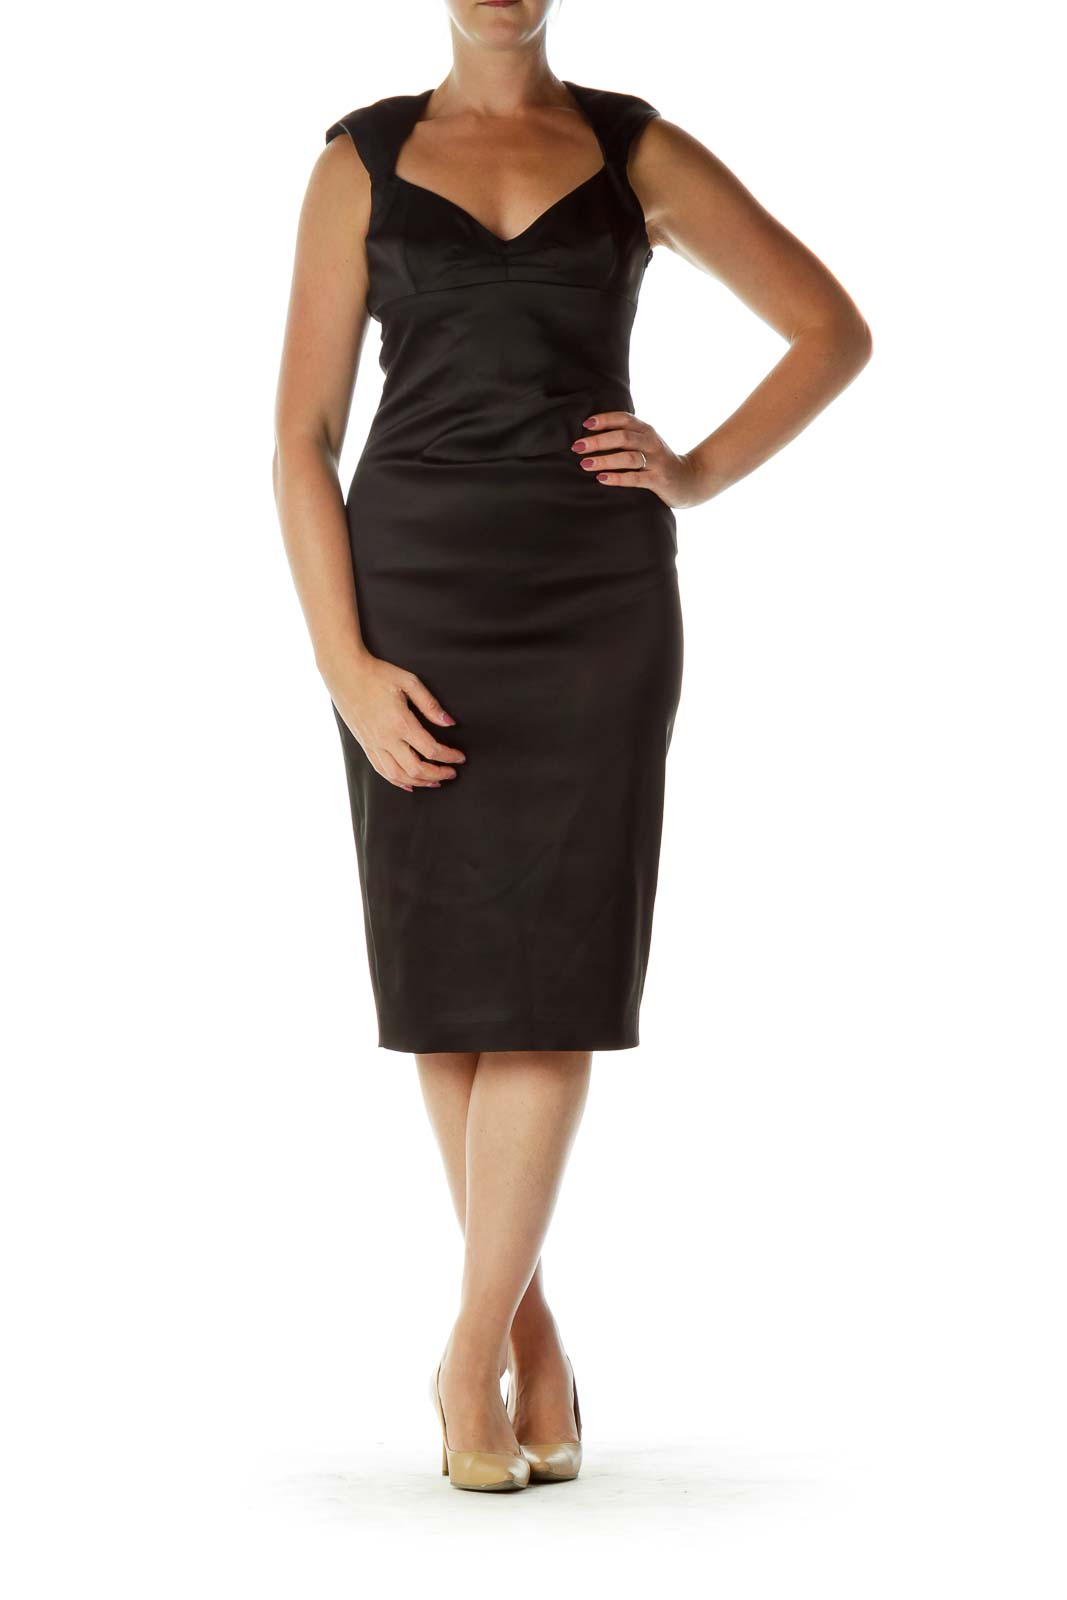 Black Sweetheart Neck Satin Cocktail Midi Dress